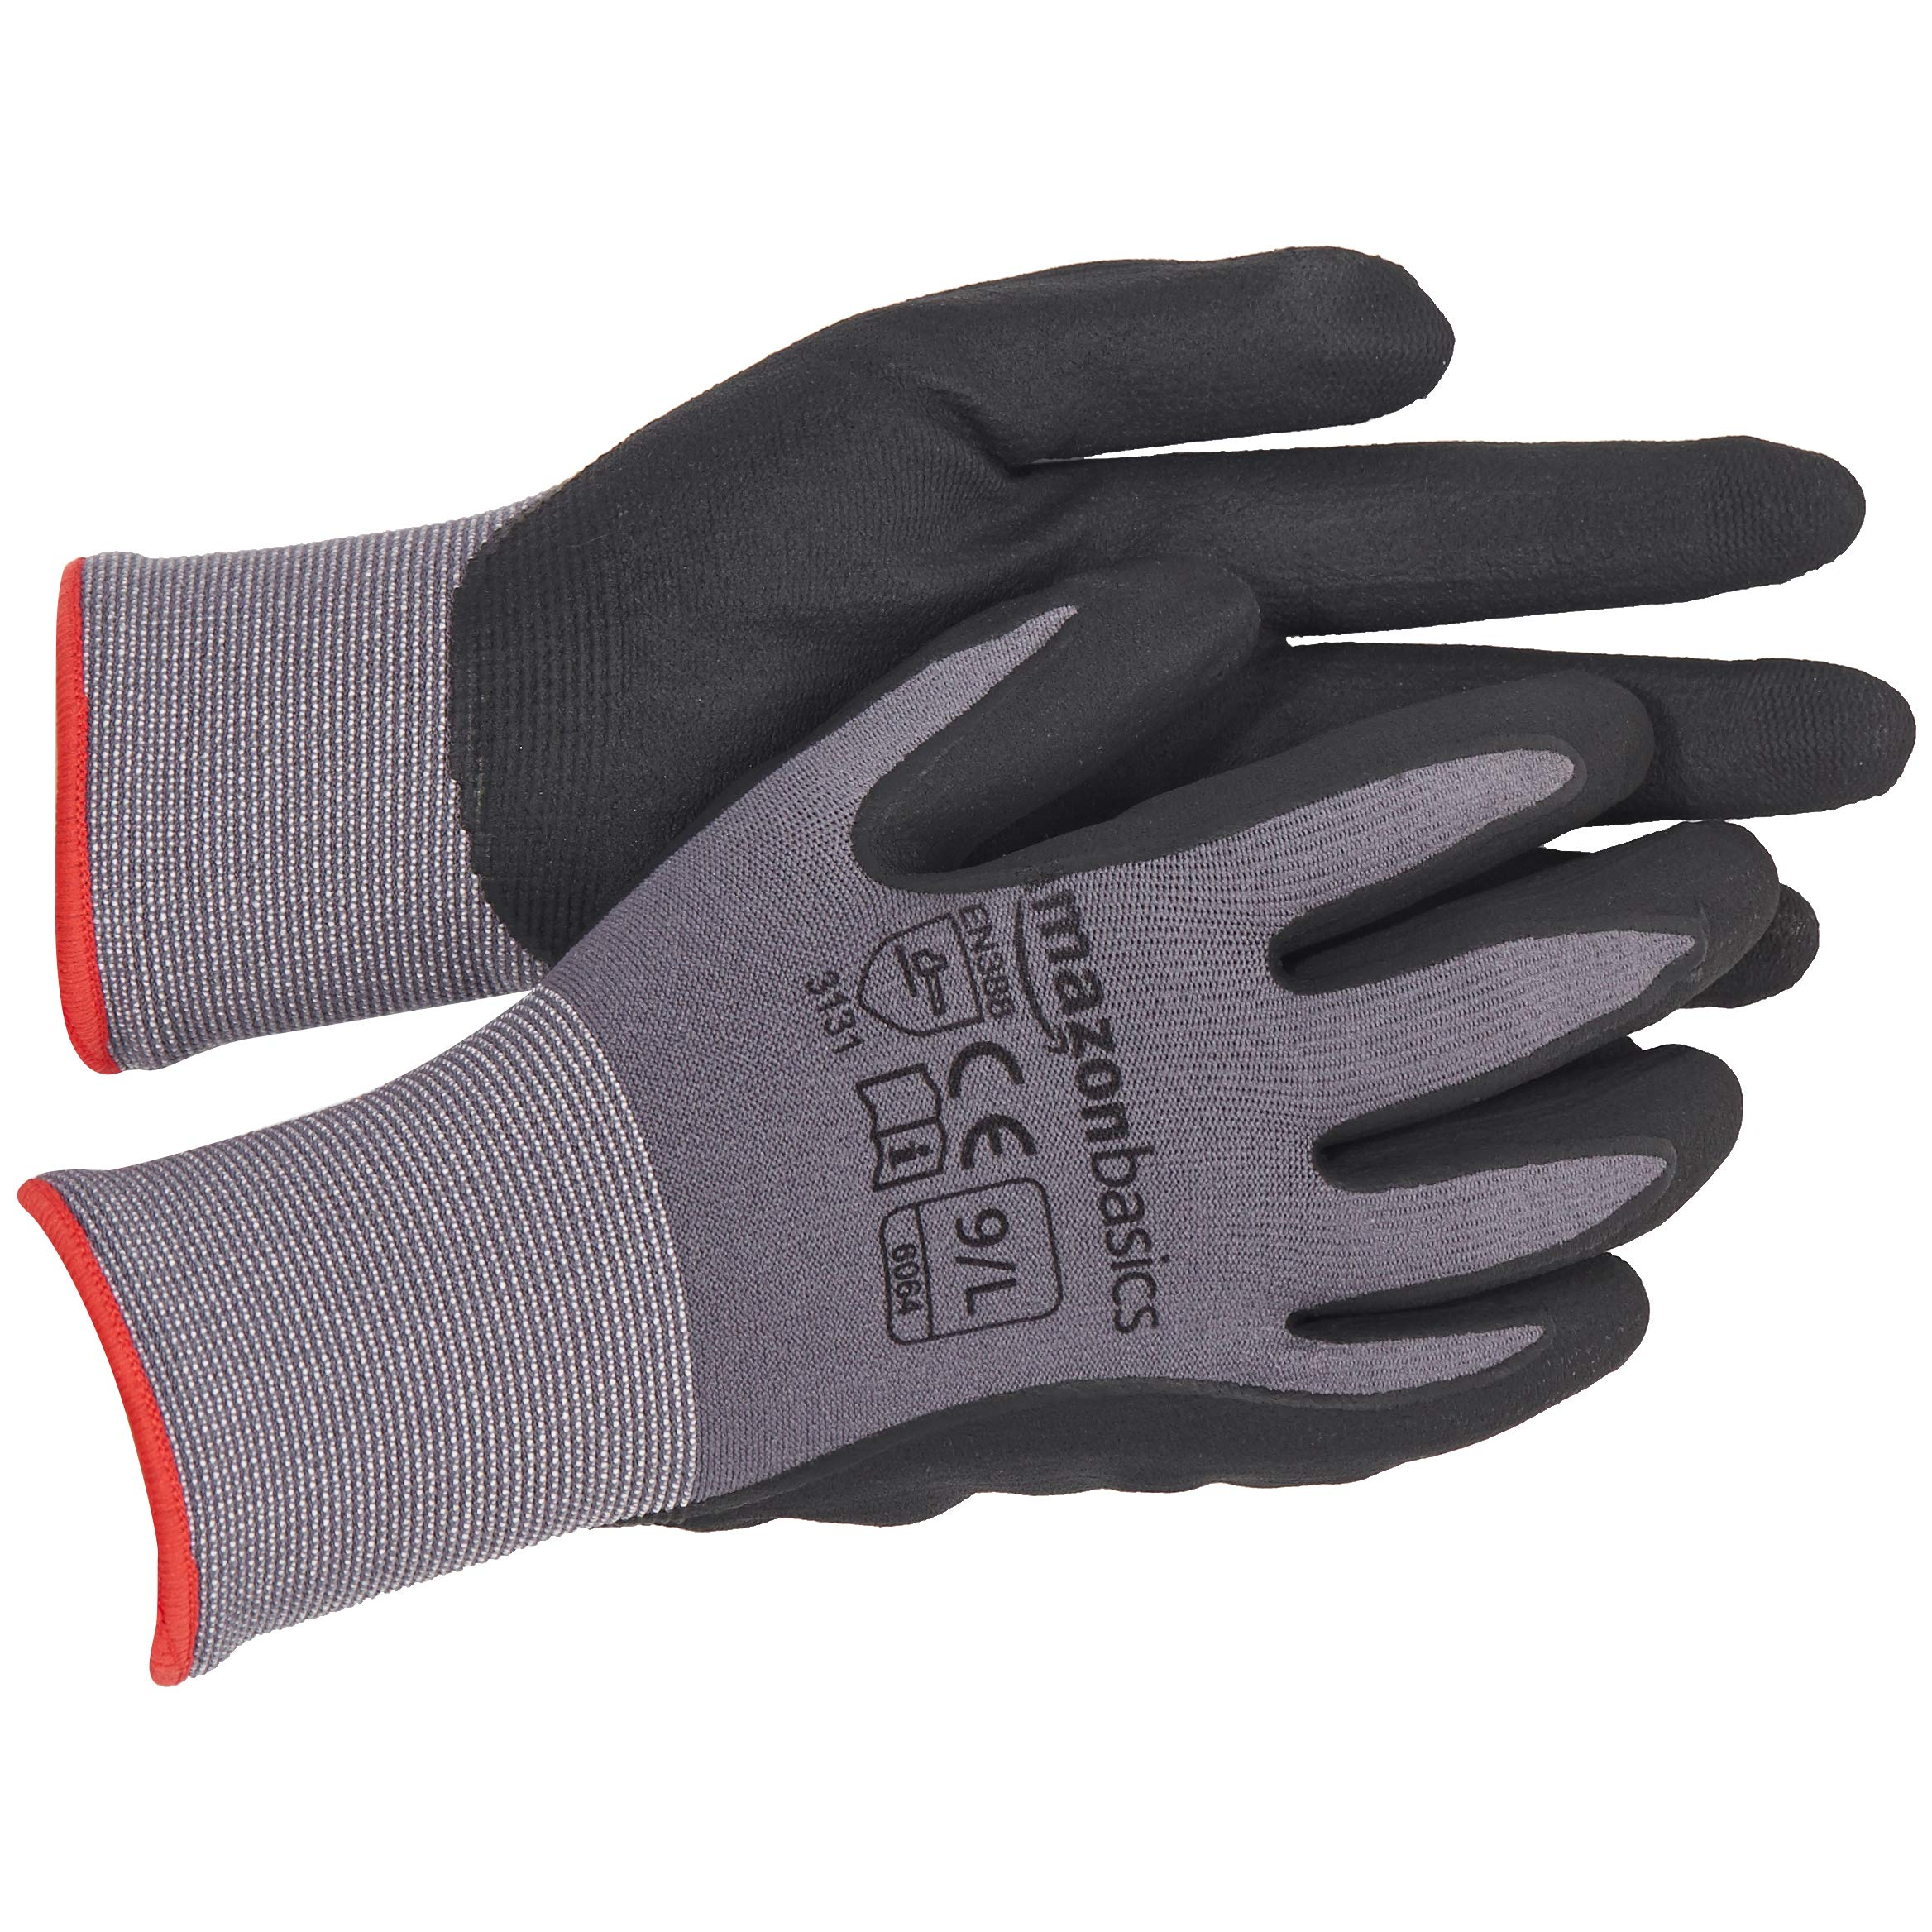 AmazonBasics Micro-Foam Nitrile Coated Work Gloves, Nylon Liner Fiber, Touch Screen, Grey, Size 9, L, 12-Pair by AmazonBasics (Image #6)